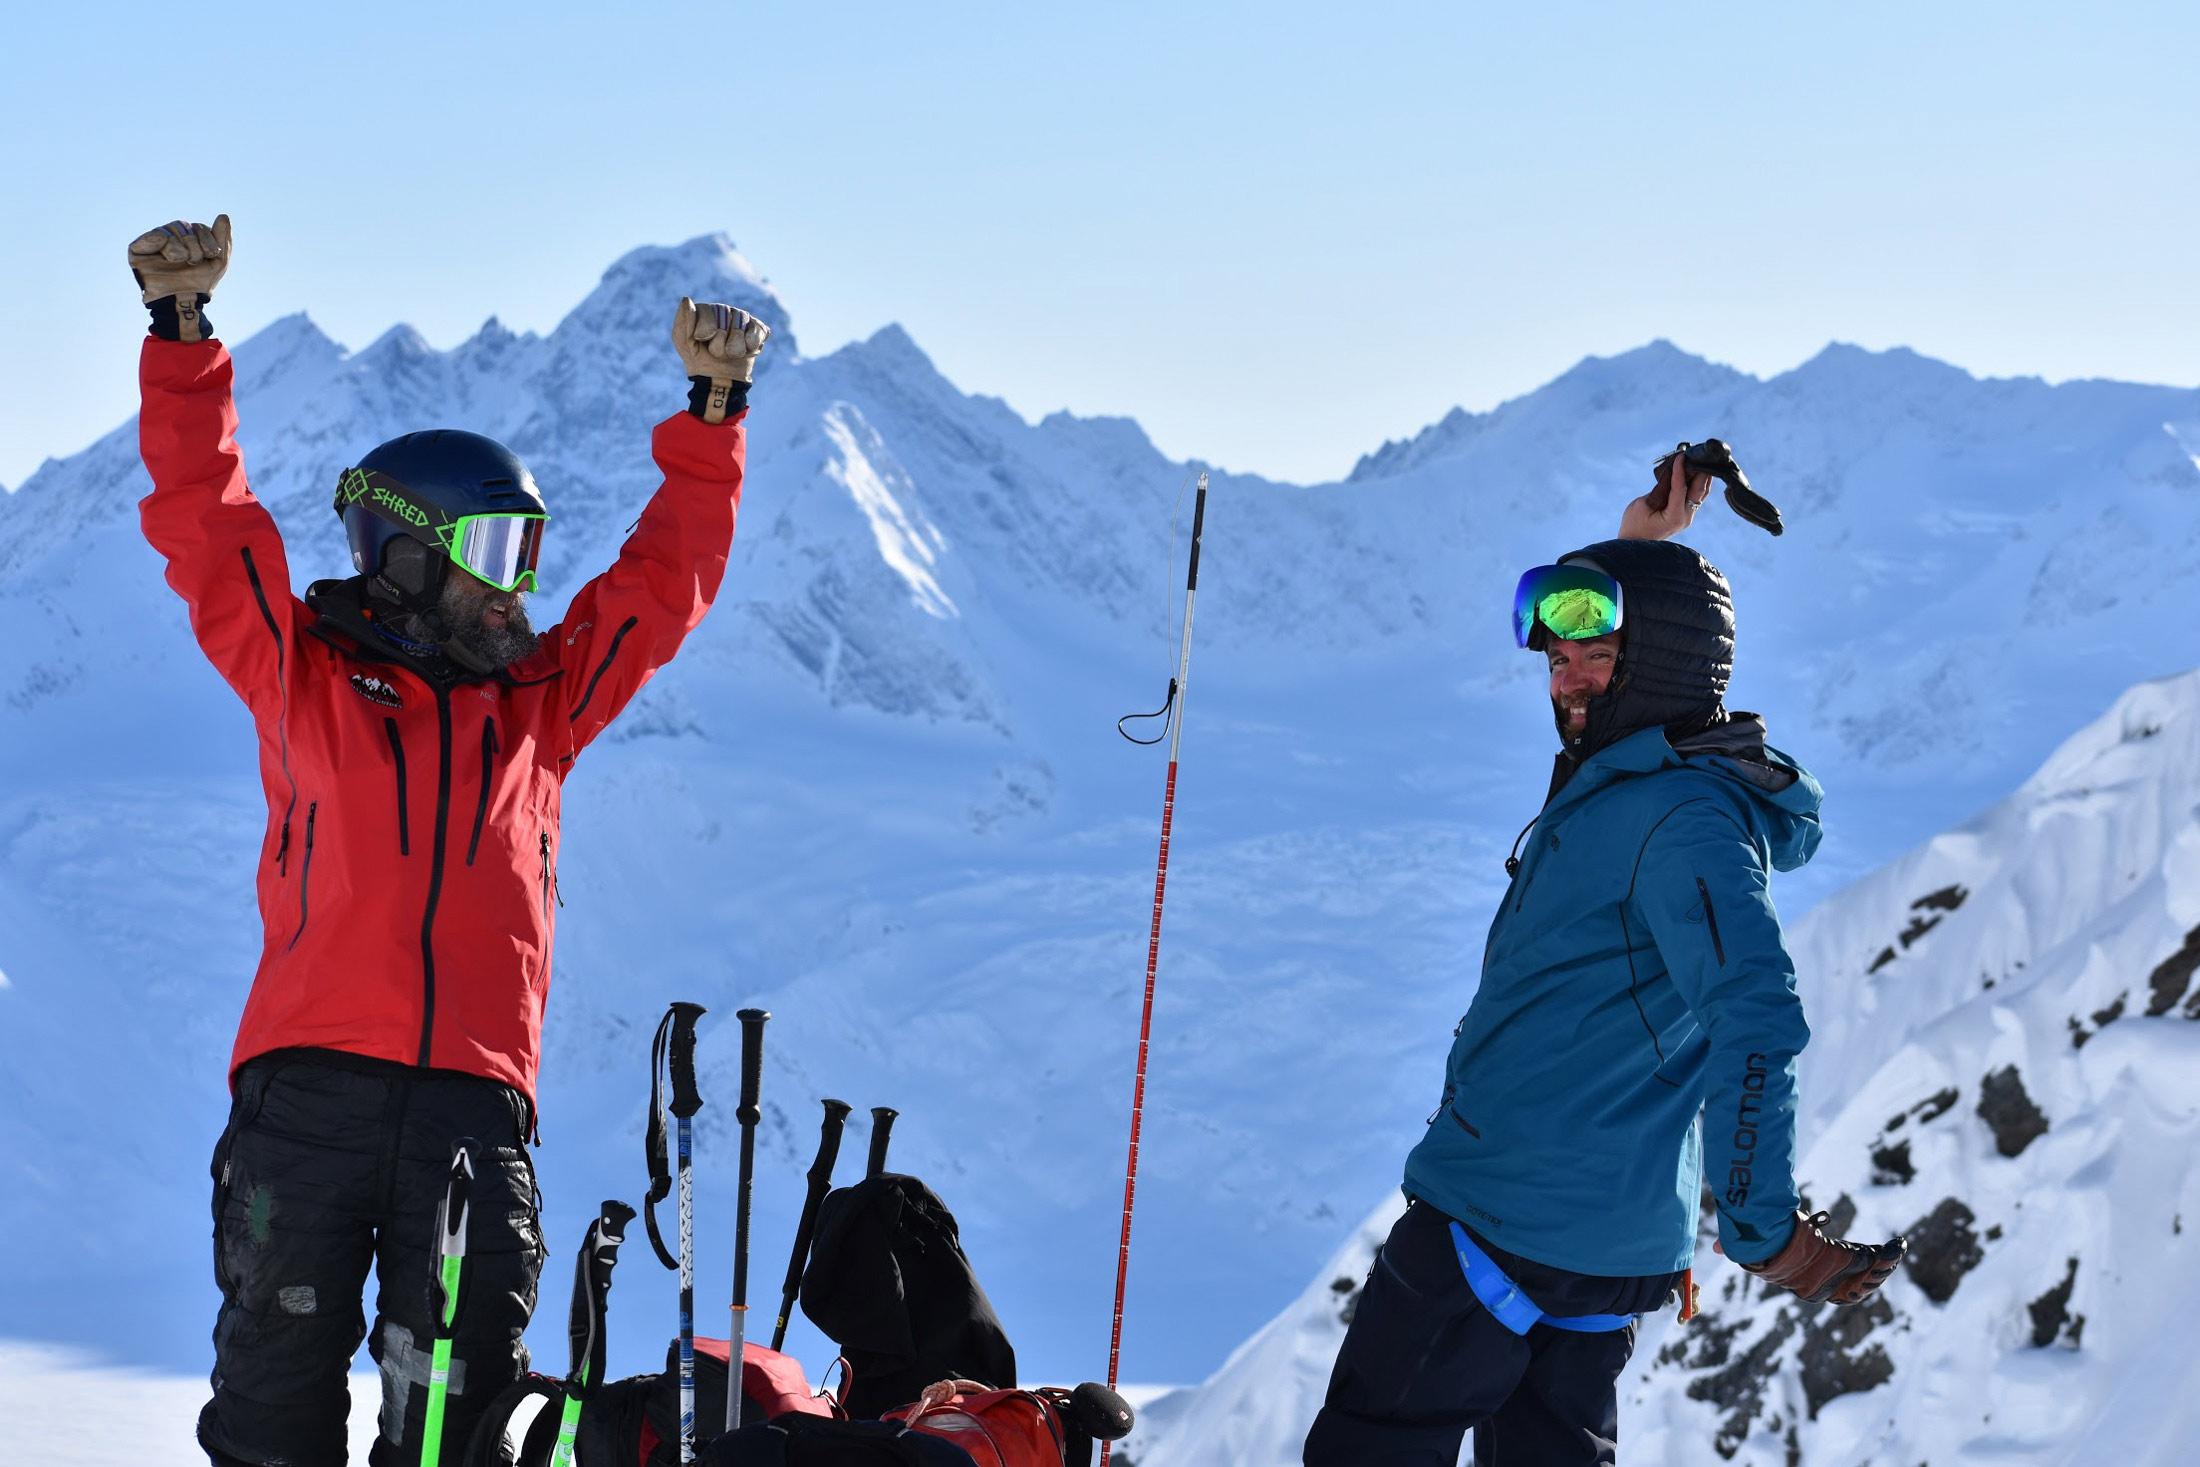 guide Jed Workamn skiers Valdez Heli-Ski Guides Alaska